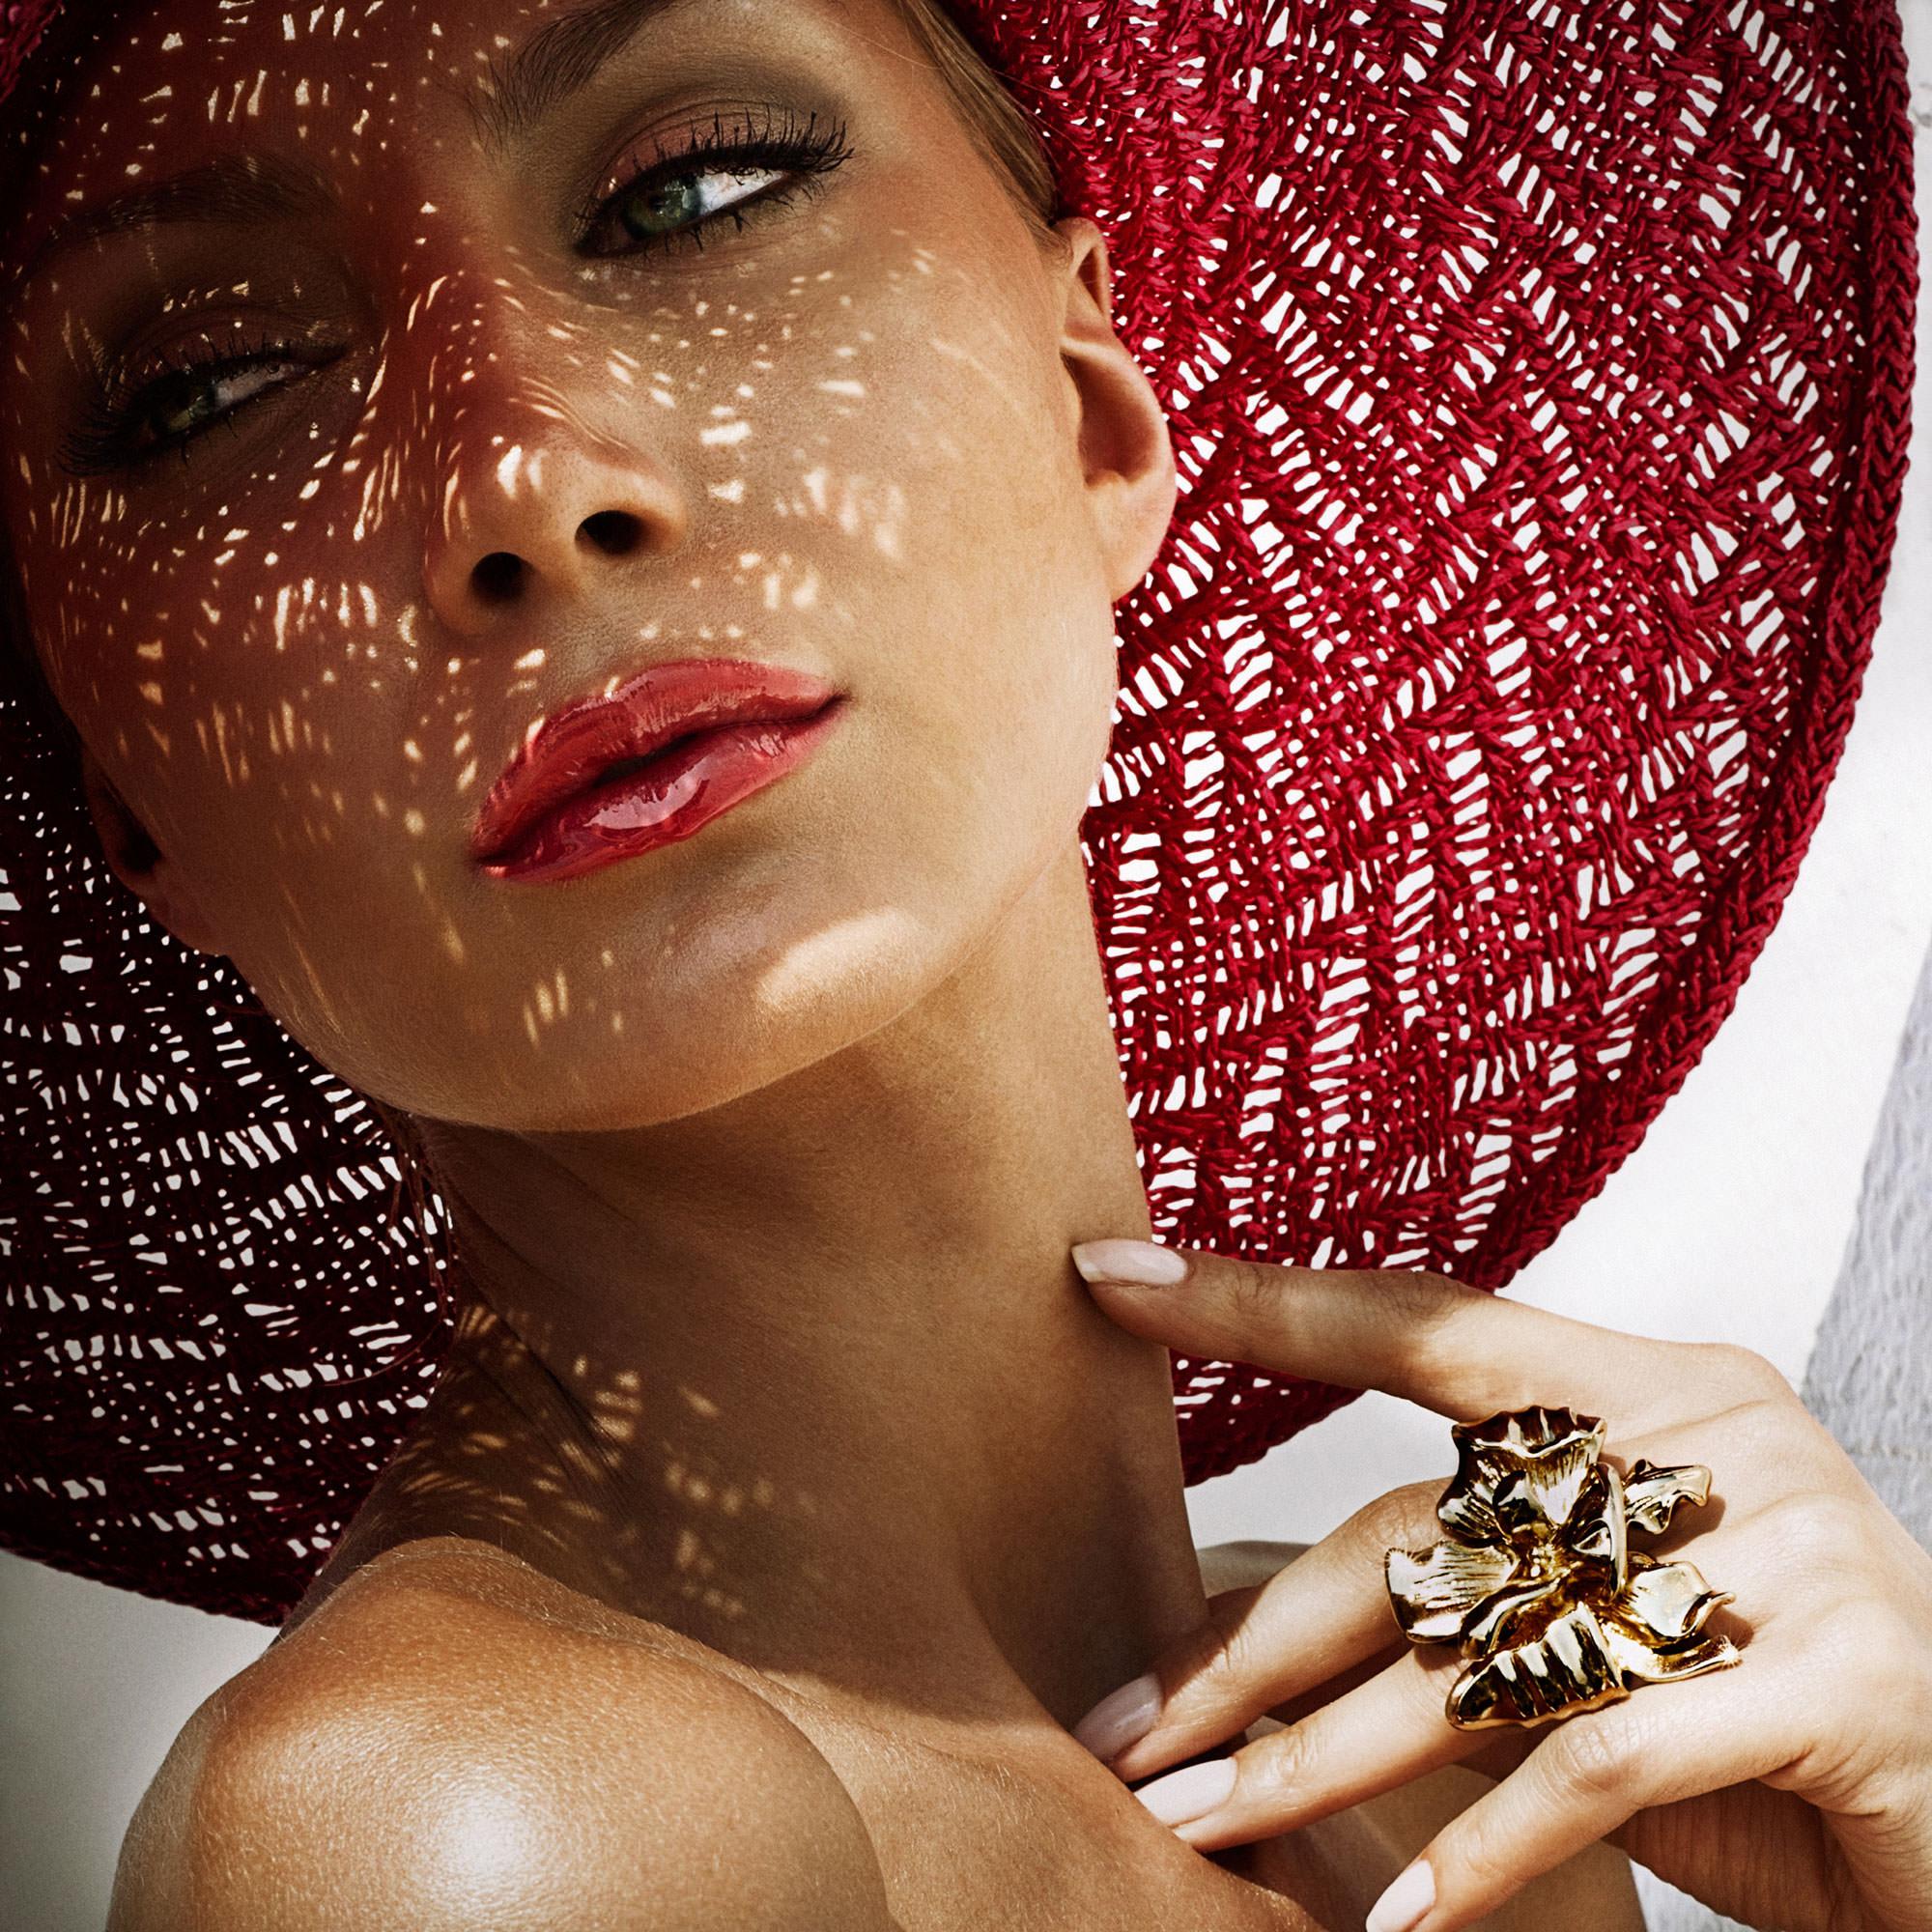 Alisa-pysareva-in-a-red-hat-summer.jpg